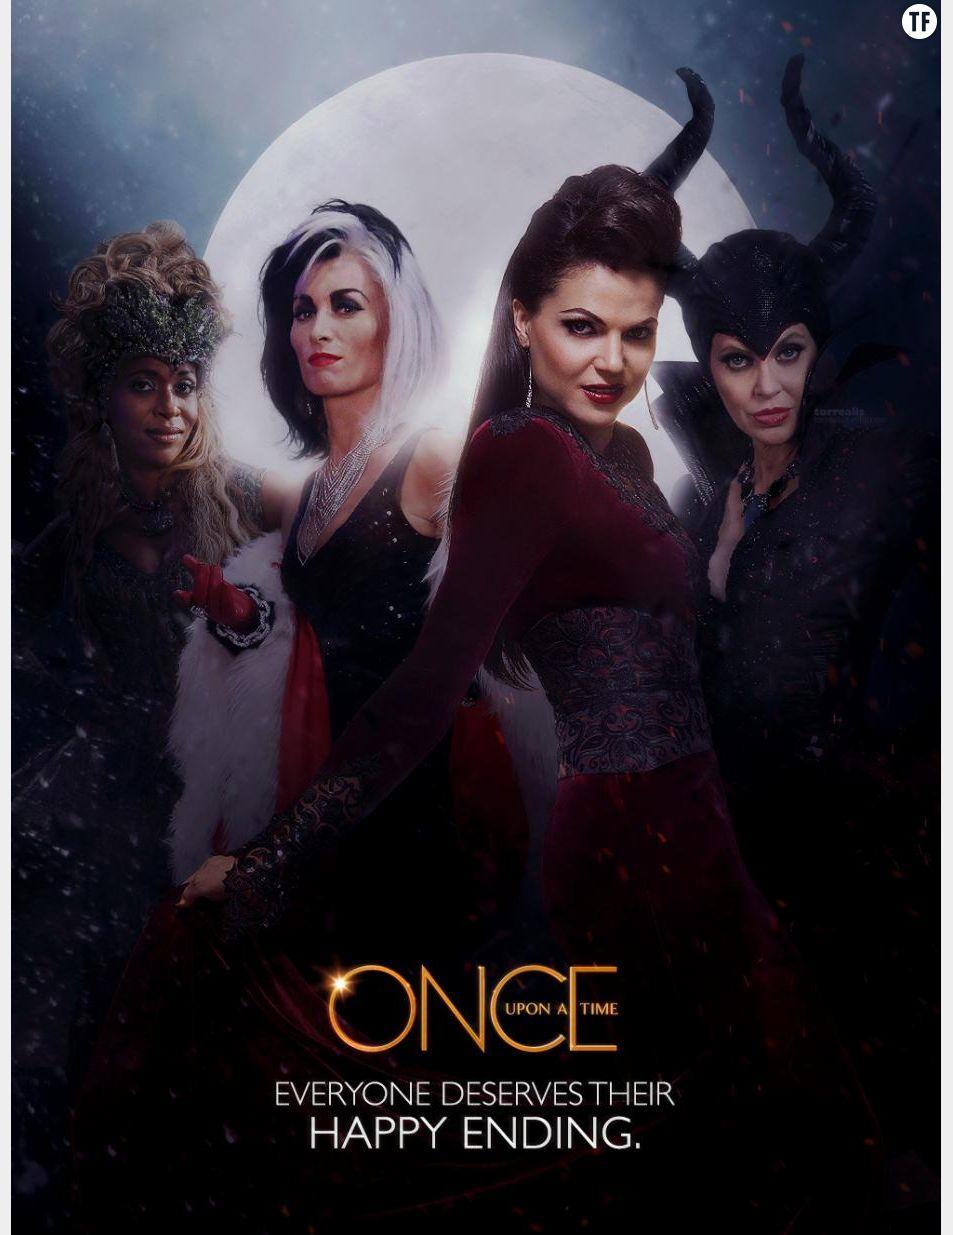 Once Upon A Time Saison 5 Streaming : saison, streaming, Saison, L'épisode, Dévoile, Terrafemina